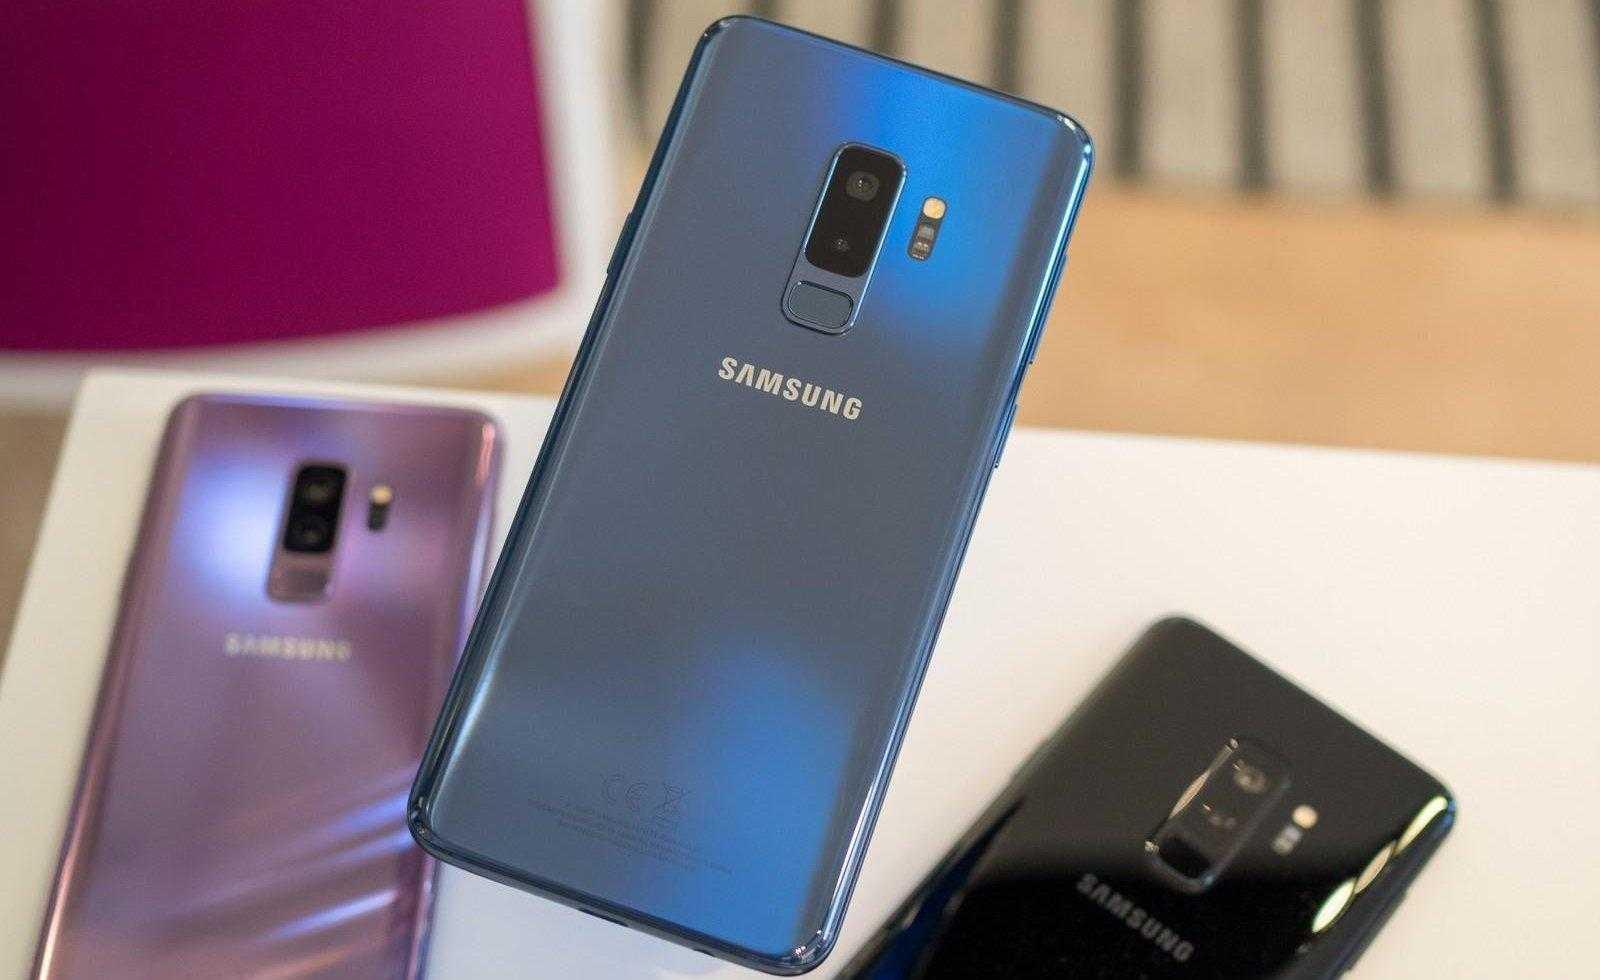 Всё о Samsung Galaxy S10: новости, слухи, дата выхода, тех. характеристики и другое (samsung galaxy s9 plus coral blue with purple and black e1549130060779)